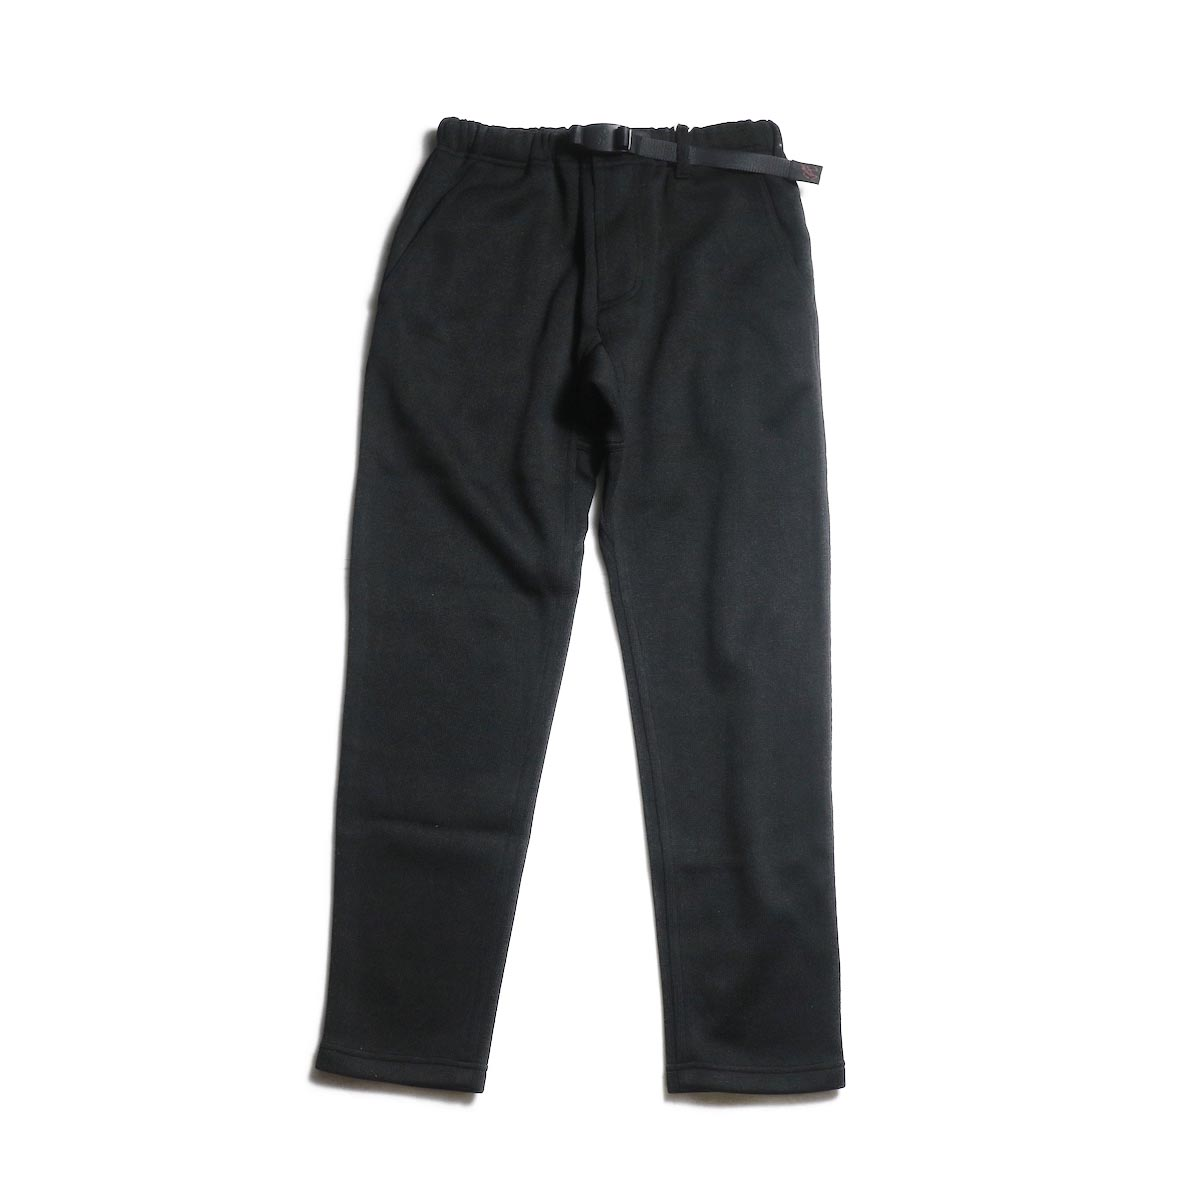 GRAMICCI / BONDING KNIT FLEECE SLIM PANTS (Black × Black)